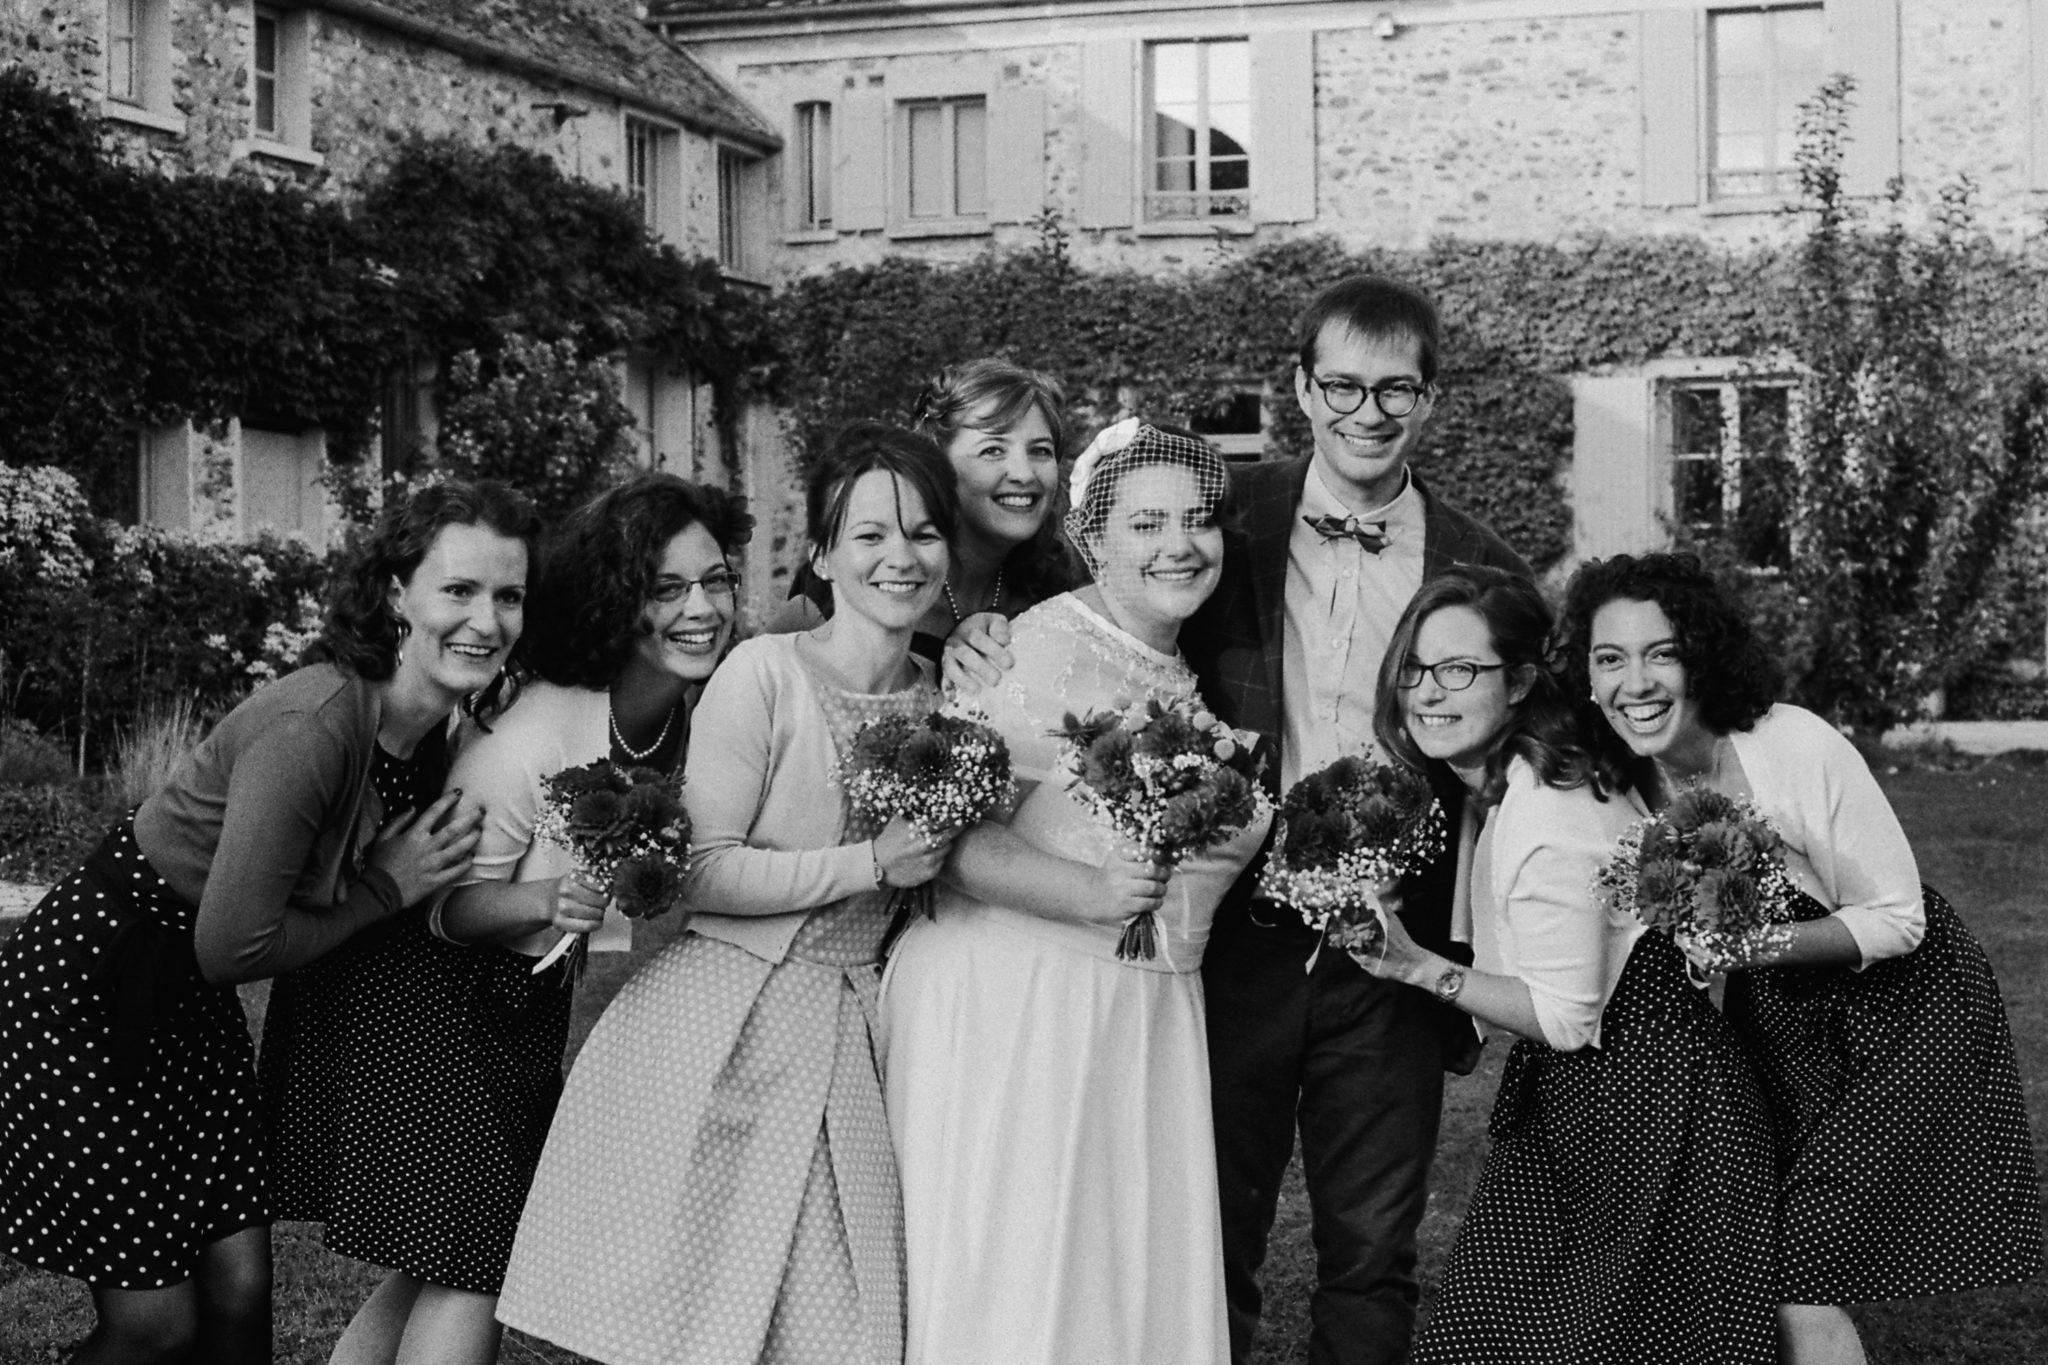 Portrait mariés bridesmaids Mariage 50s Domaine Mauvoisin Lommoye